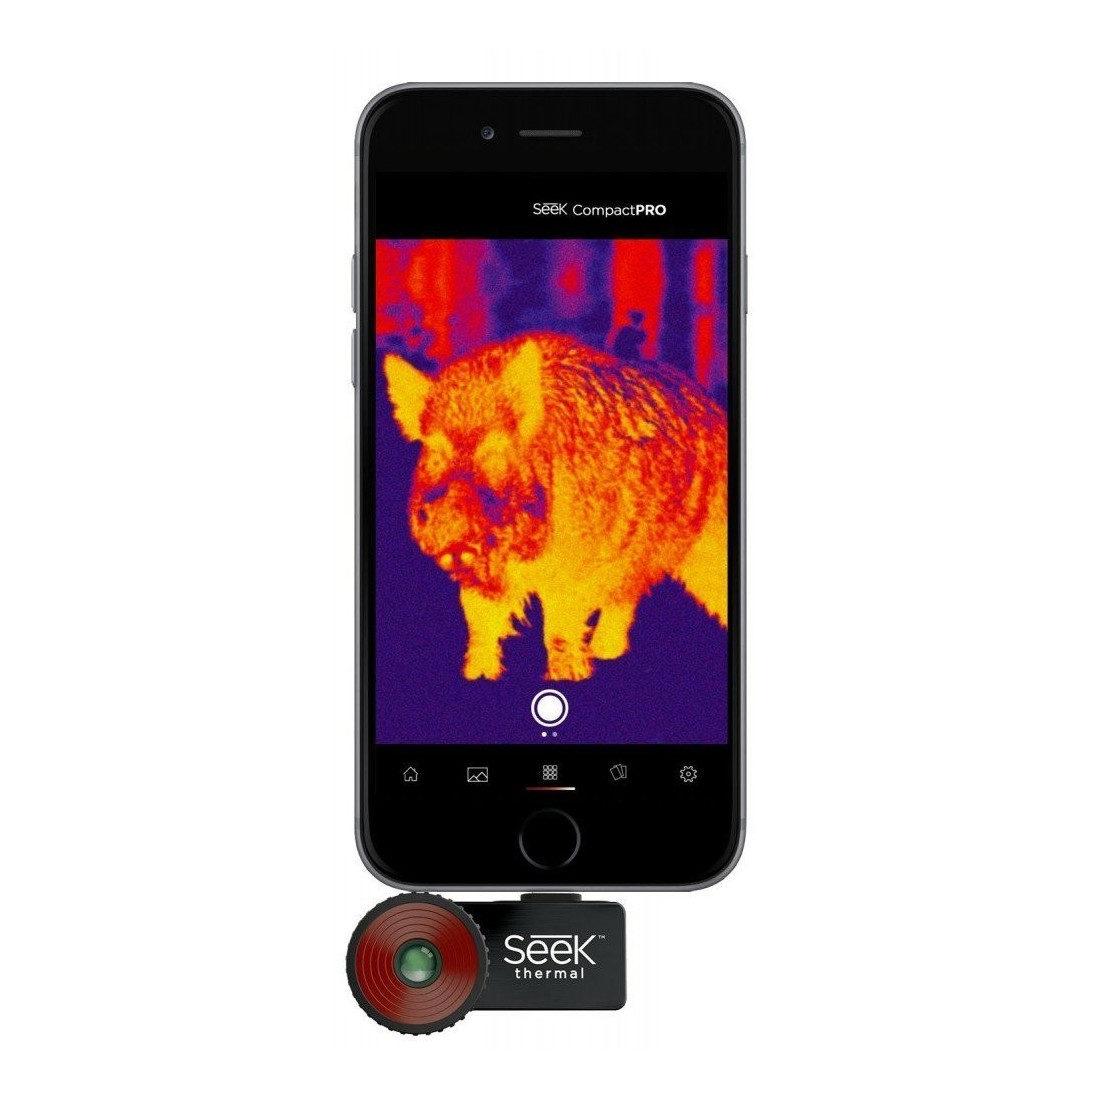 6f6df771a1f Seek Thermal Compact Pro warmtebeeldcamera voor iOS